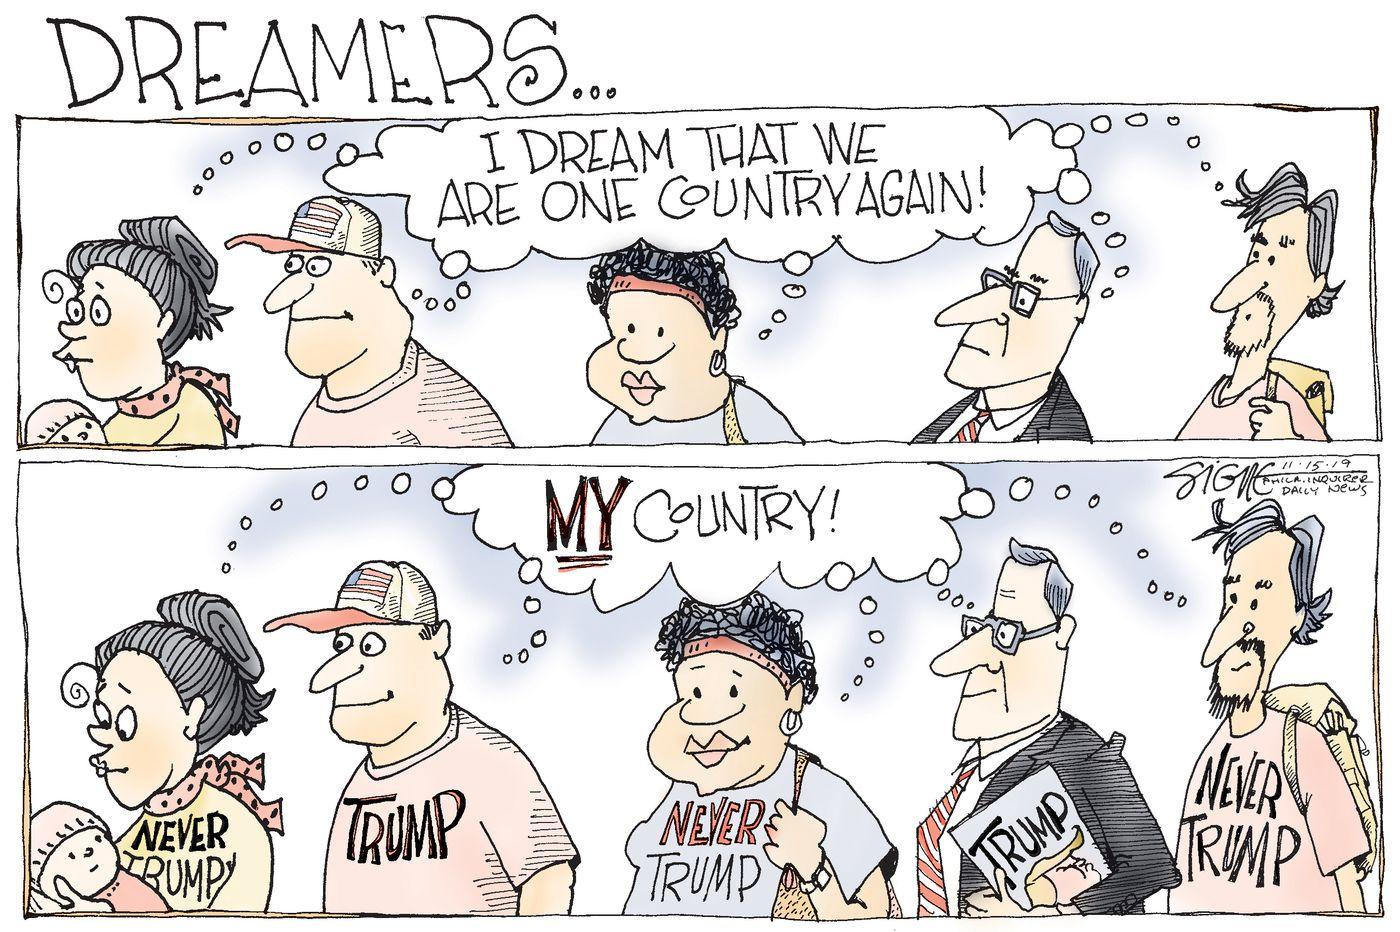 Political Cartoon: Dreaming of Donald Trump